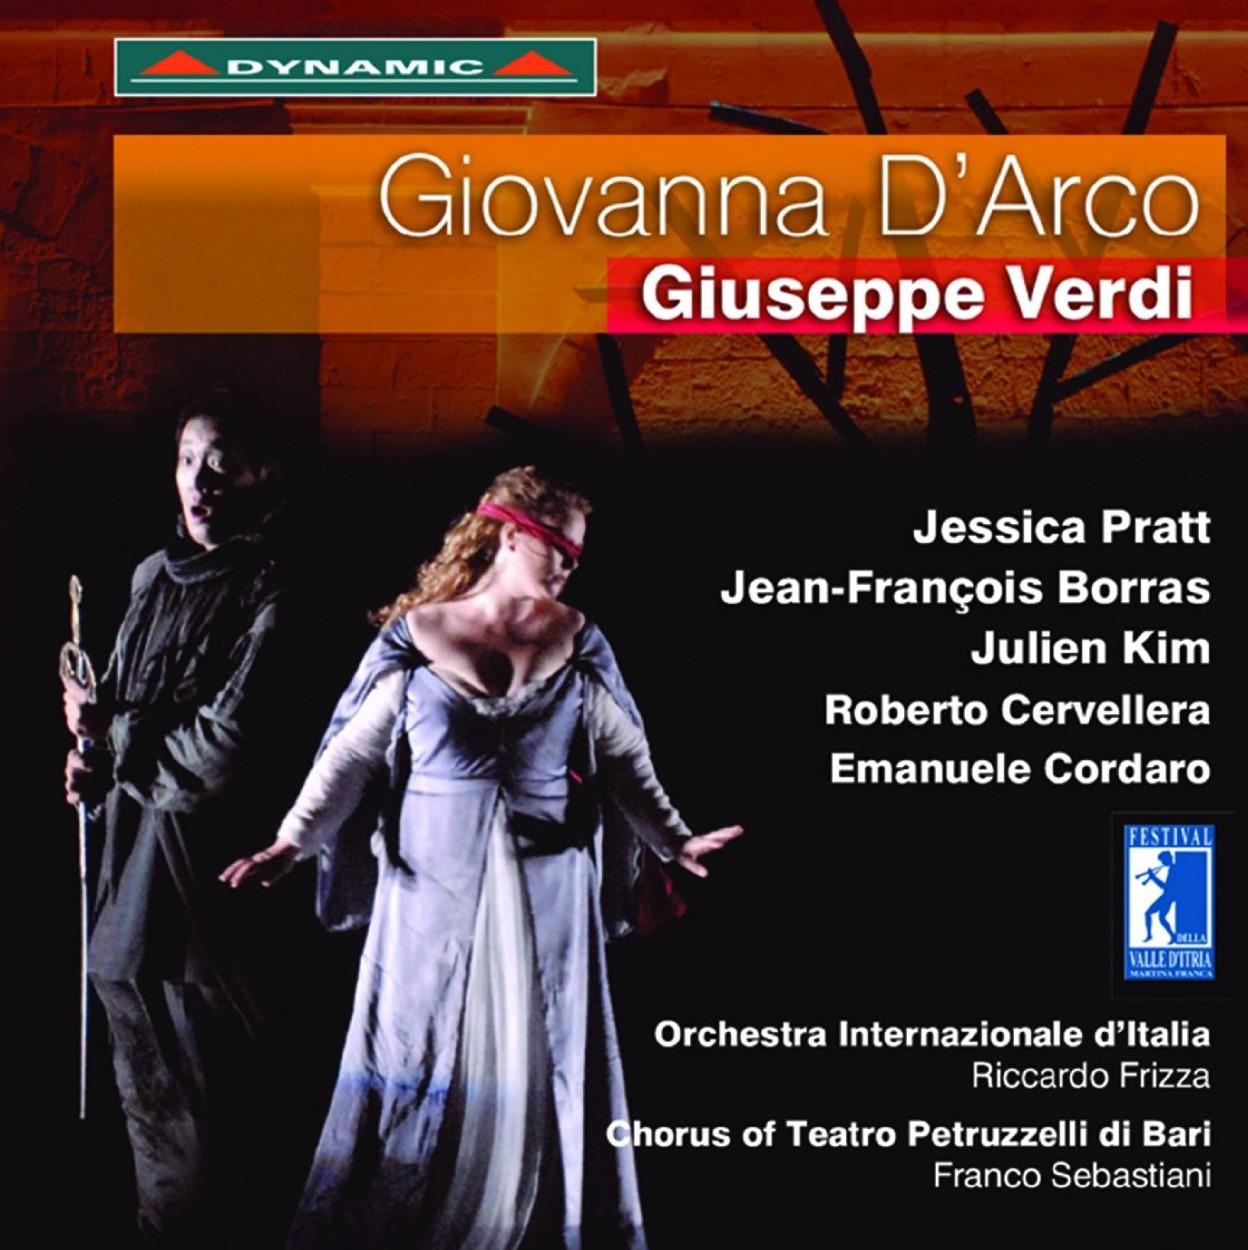 SINGER SPOTLIGHT: Soprano JESSICA PRATT, star of Festivale della Valle d'Itria's 2013 production of Giuseppe Verdi's GIOVANNA D'ARCO, released on CD and DVD by Dynamic [Cover art © by Dynamic]